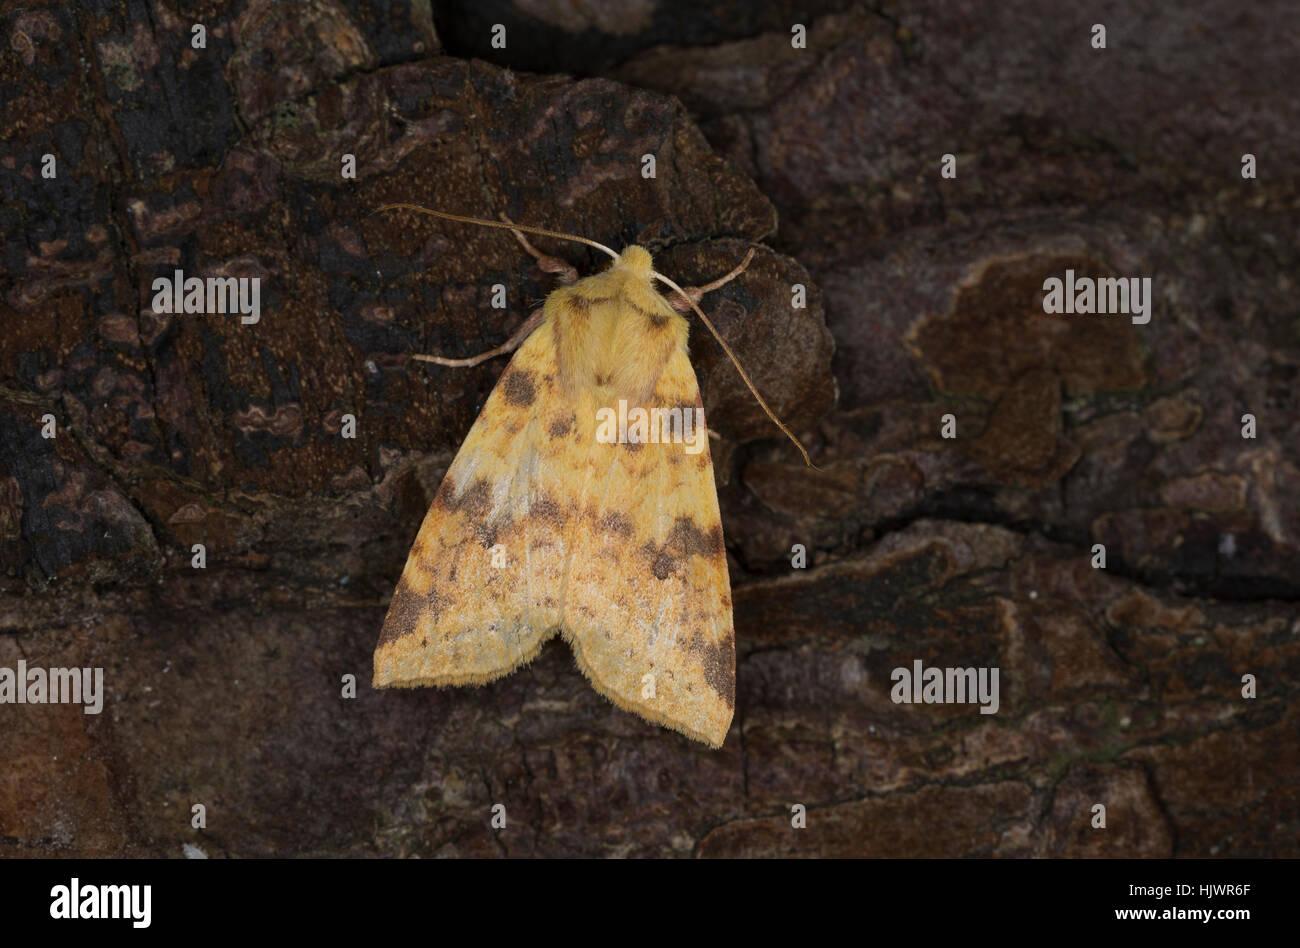 Bleich-Gelbeule, Bleiche Weiden-Gelbeule, Bleiche Gelbeule, Xanthia icteritia, Cirrhia icteritia, Sallow. Eulenfalter, - Stock Image